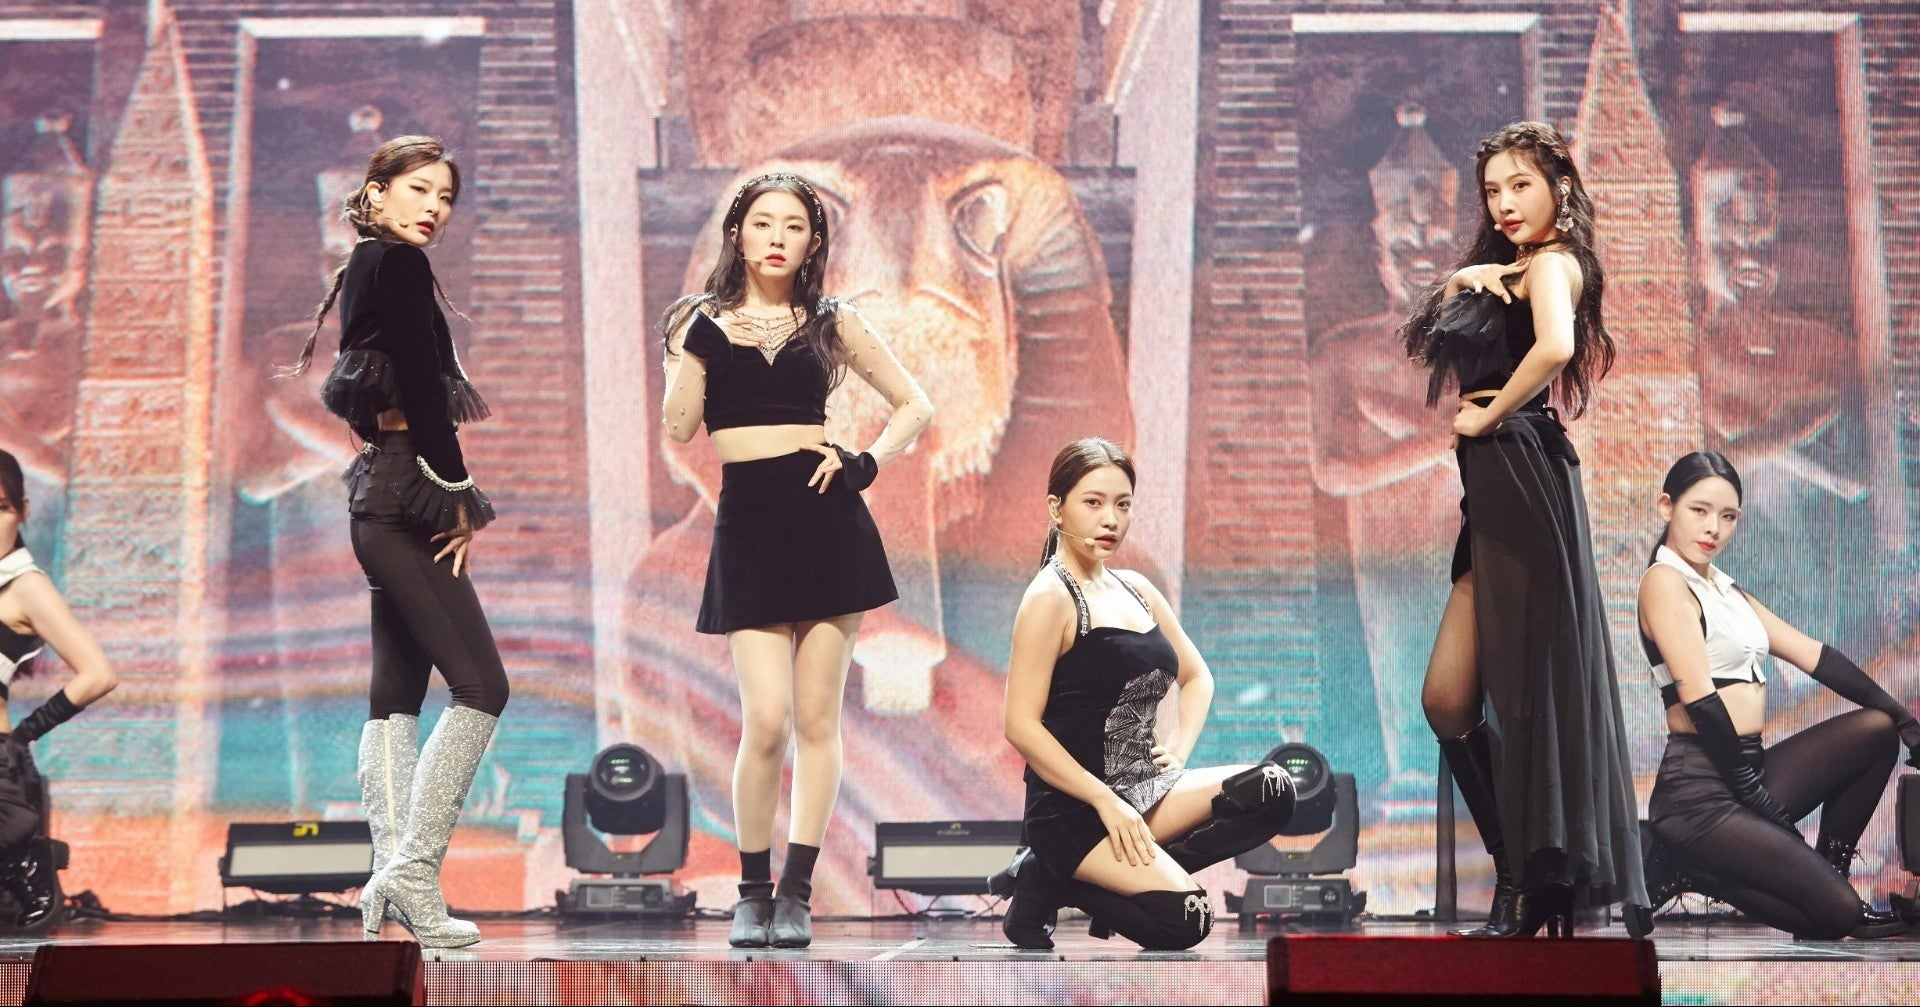 Red Velvetが魅せた25分間とは... a-nation online 2020 初のオンライン開催。